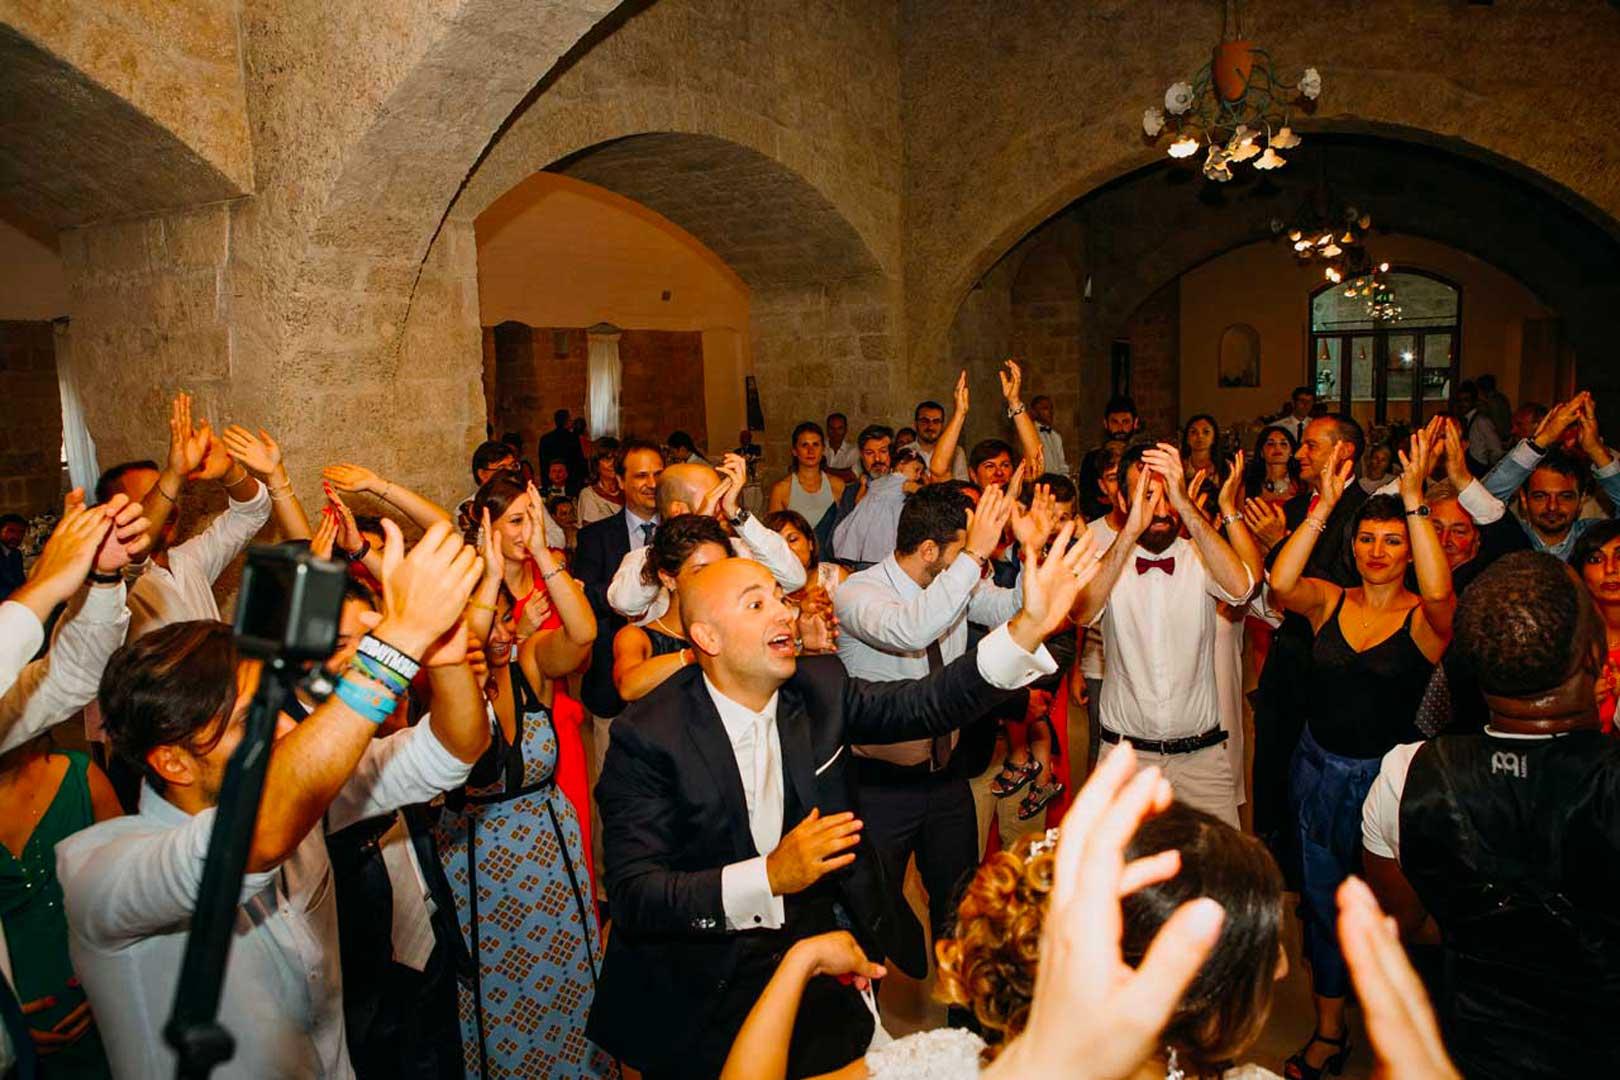 036-festa-matrimonio-gianni-lepore-fotografo